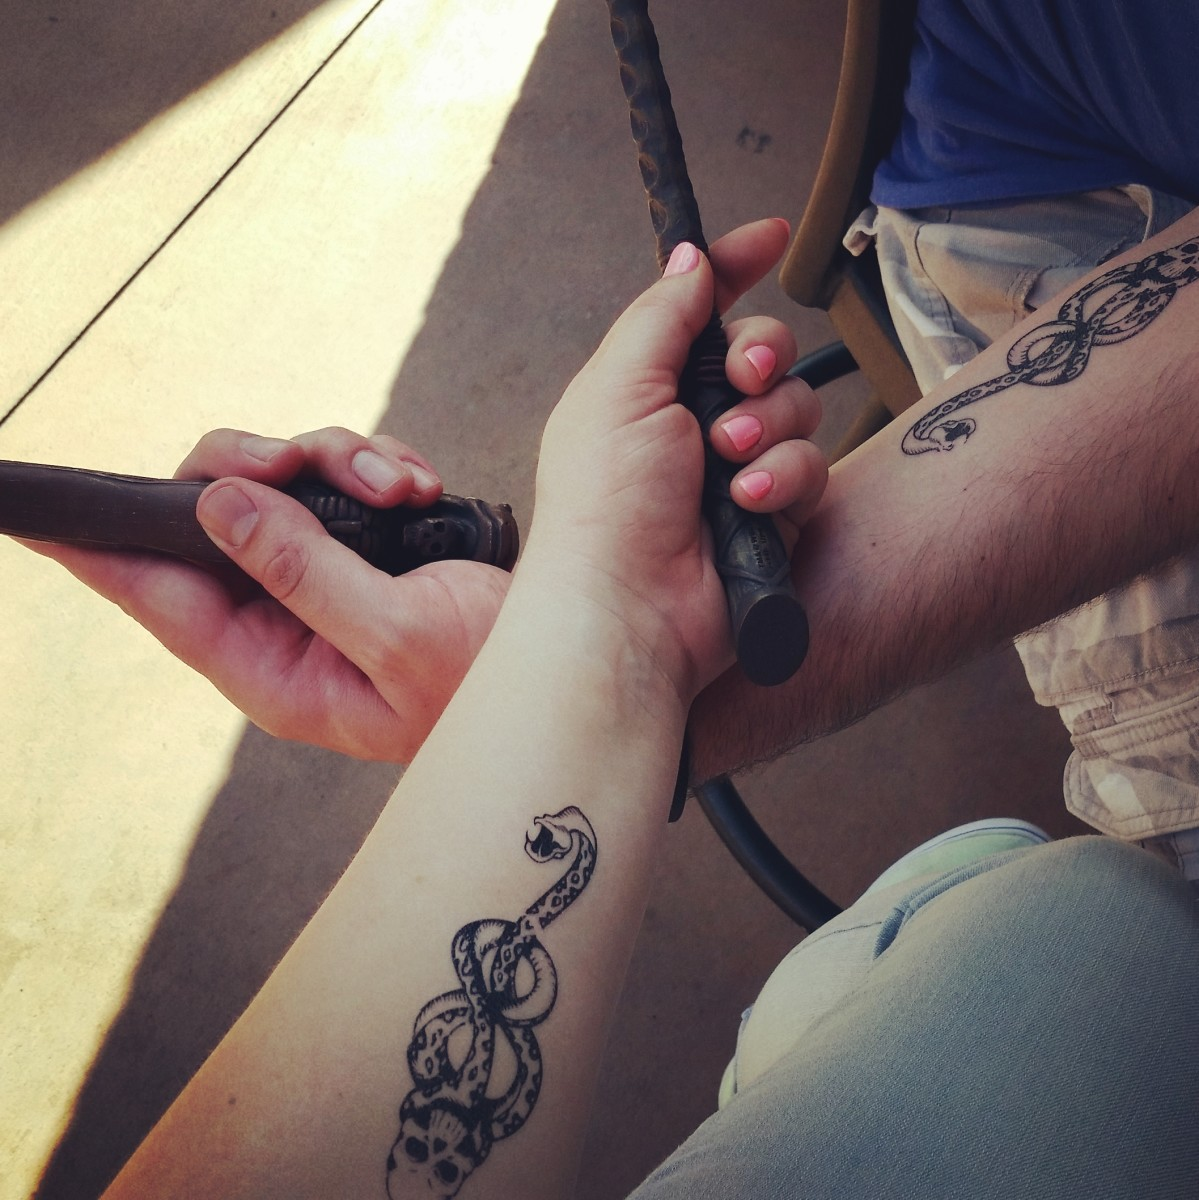 Dark mark tattoos at the Wizarding World of Harry Potter